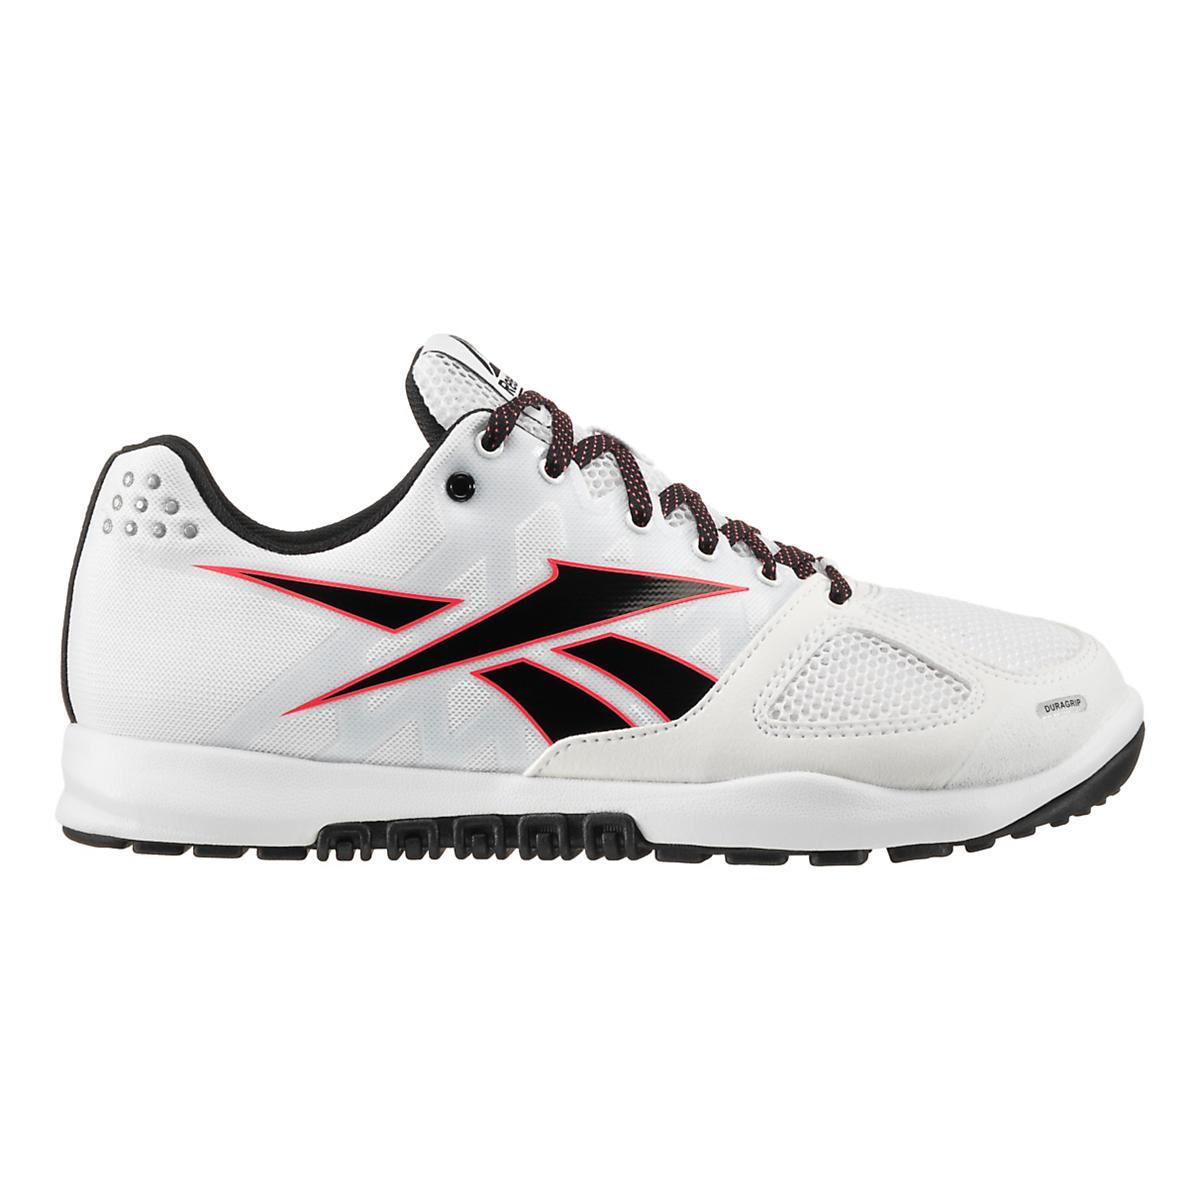 Mens Reebok CrossFit Nano 2 Be More Human Cross Training Shoe at Road  Runner Sports b2c875aab